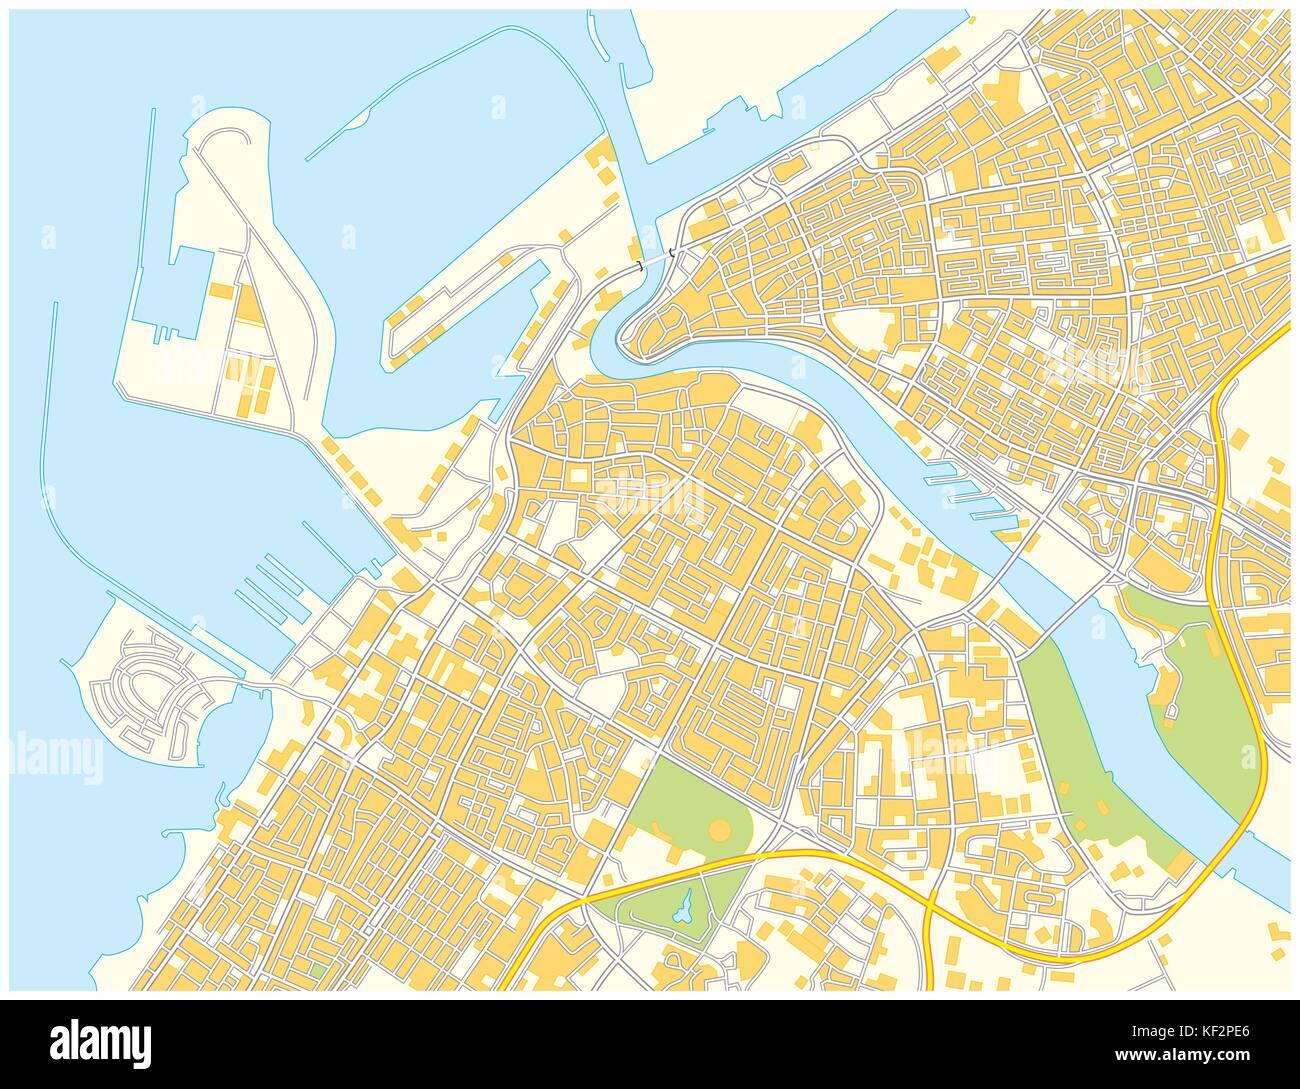 dubai city map stock image